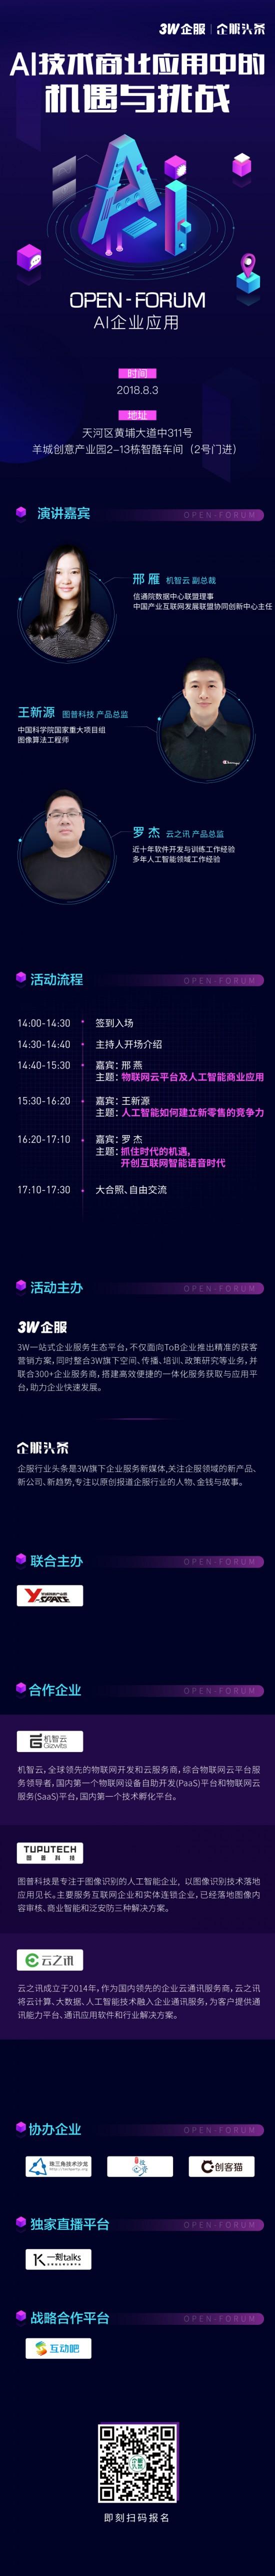 【3W Open Forum系列沙龙】AI技术商业应用中的机遇与挑战--广州